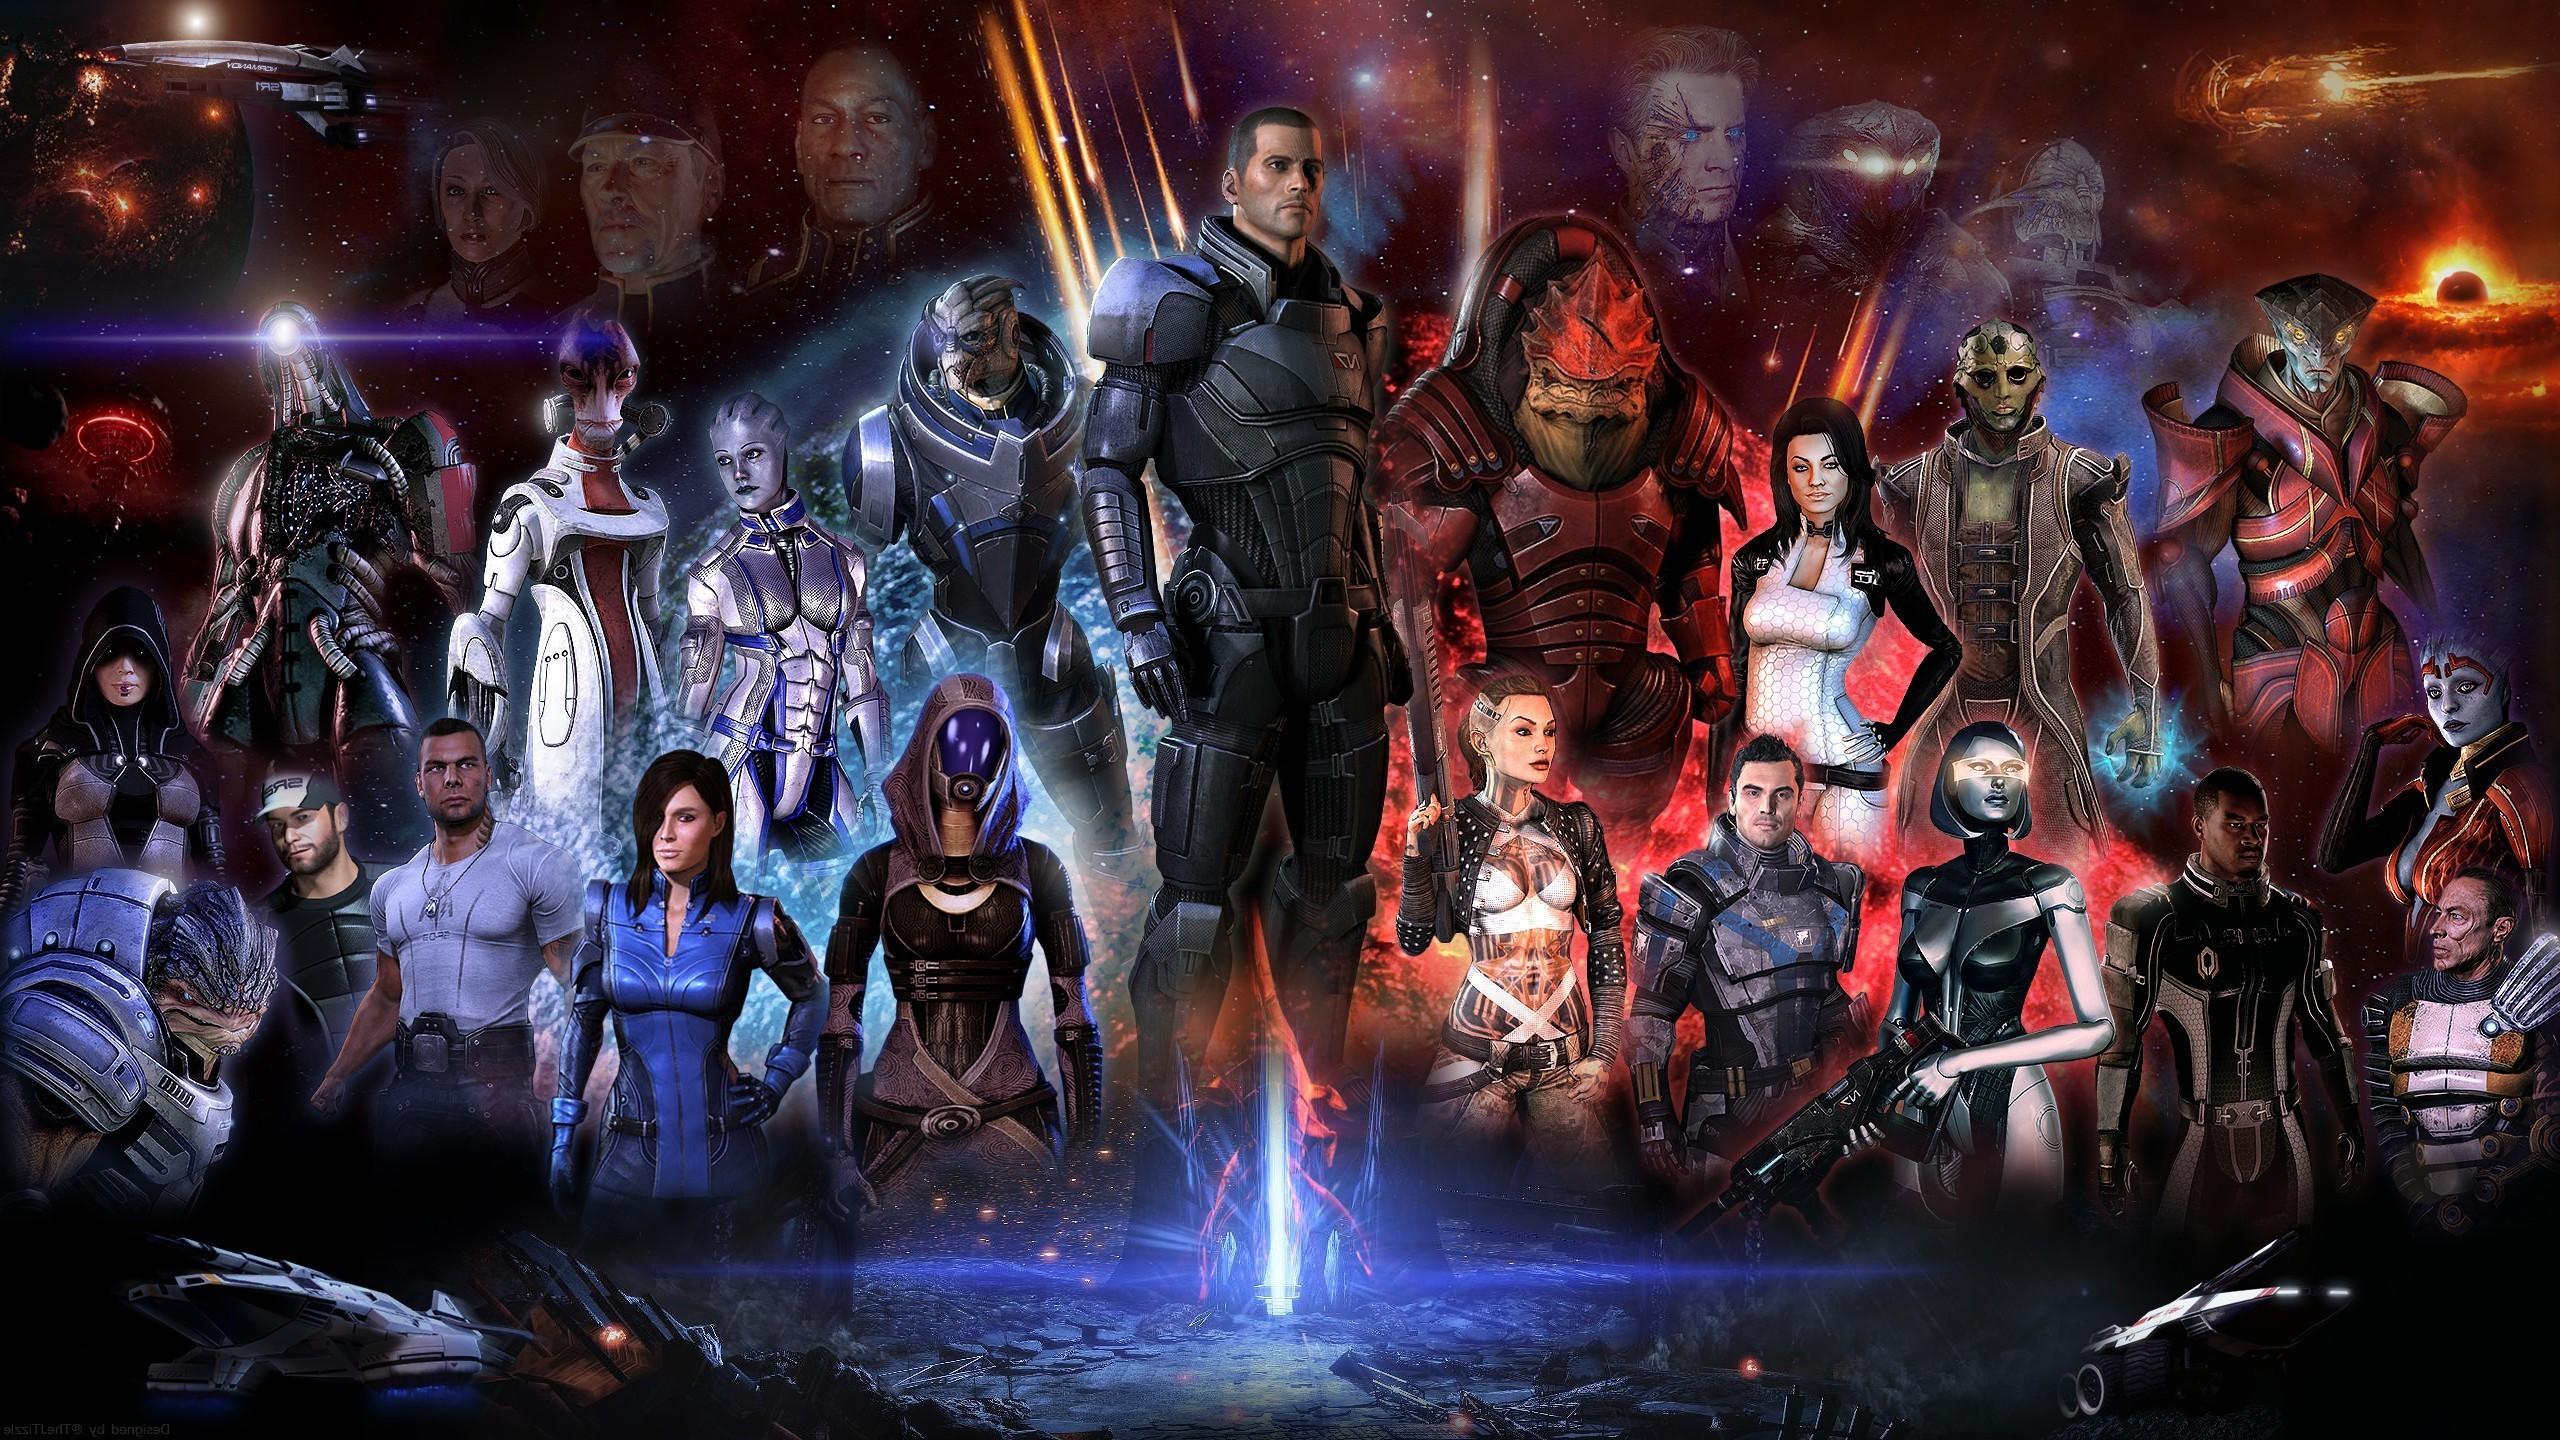 Mass Effect 2 Wallpaper 80 Pictures